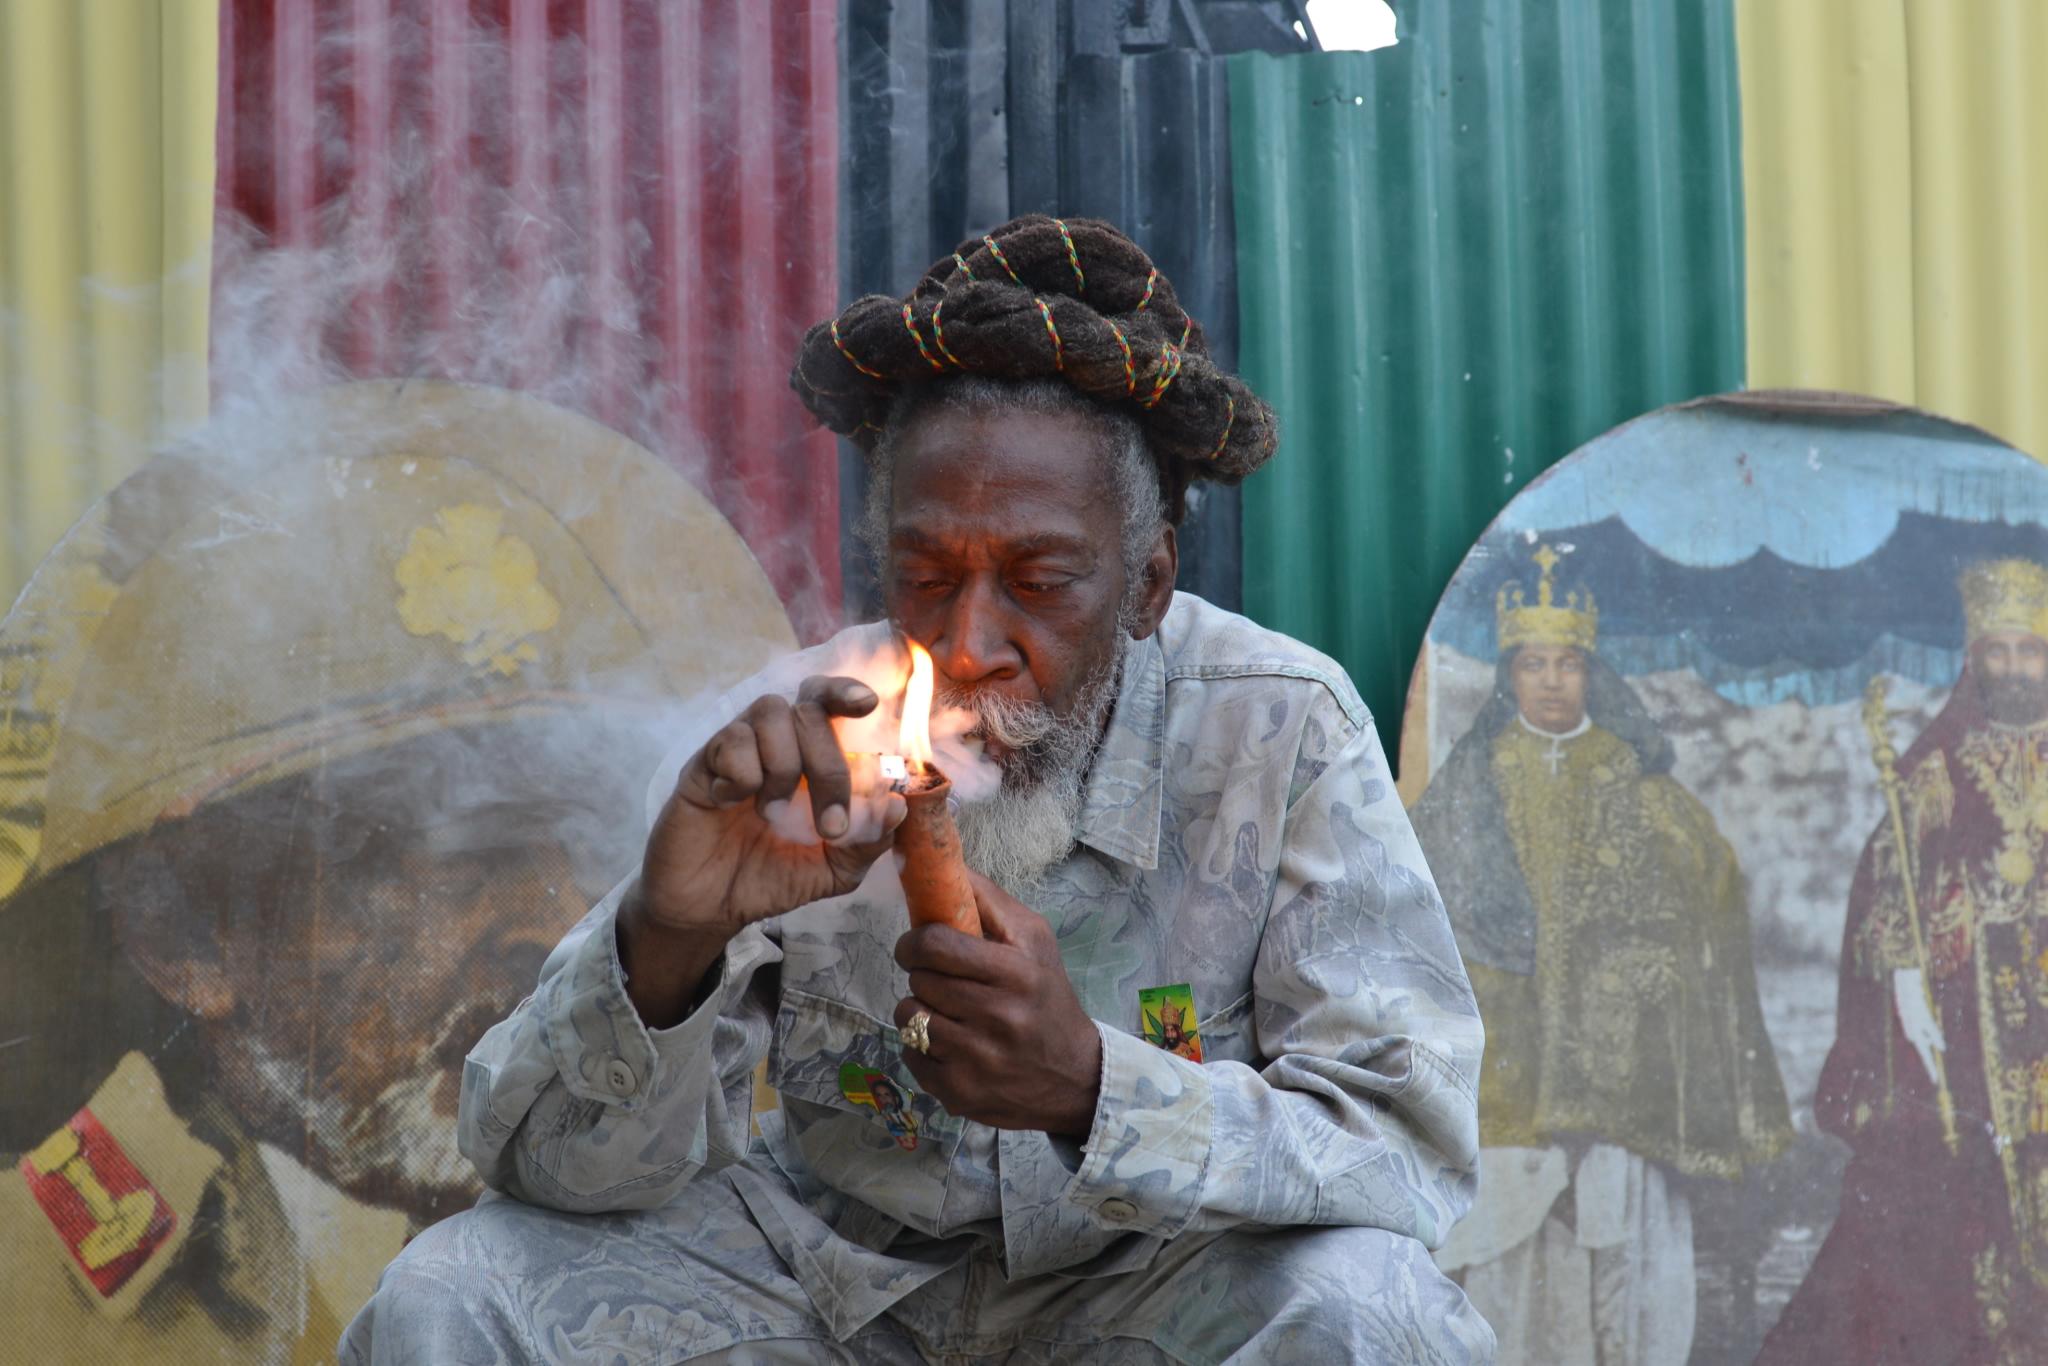 Photo: Smoking pot in Jamaica